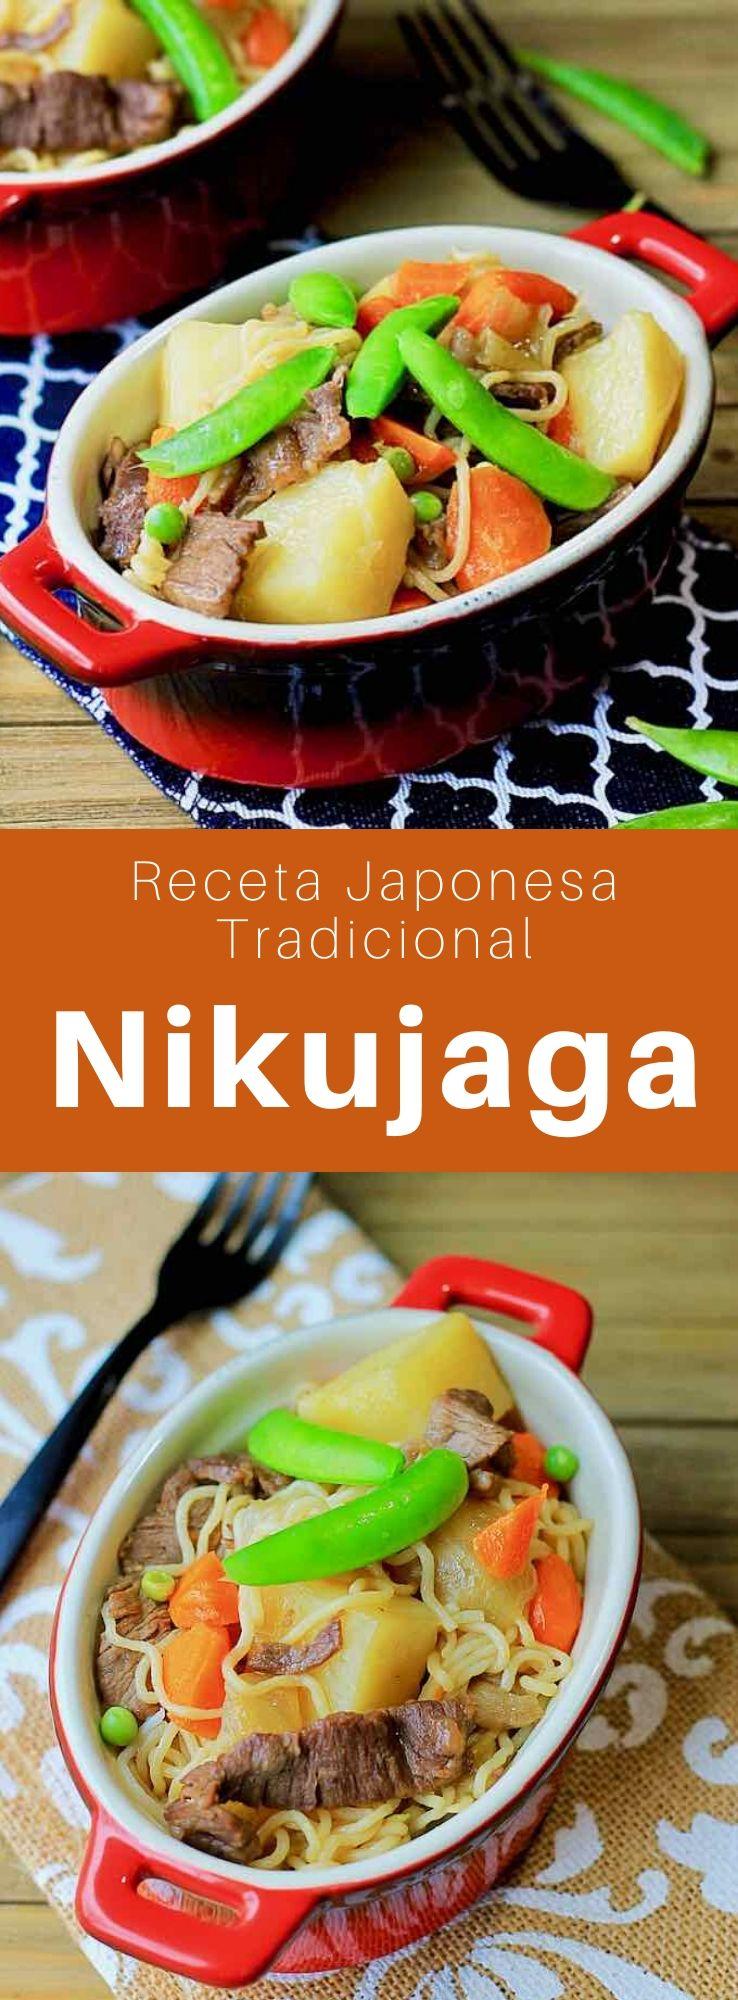 El nikujaga (肉じゃが), literalmente